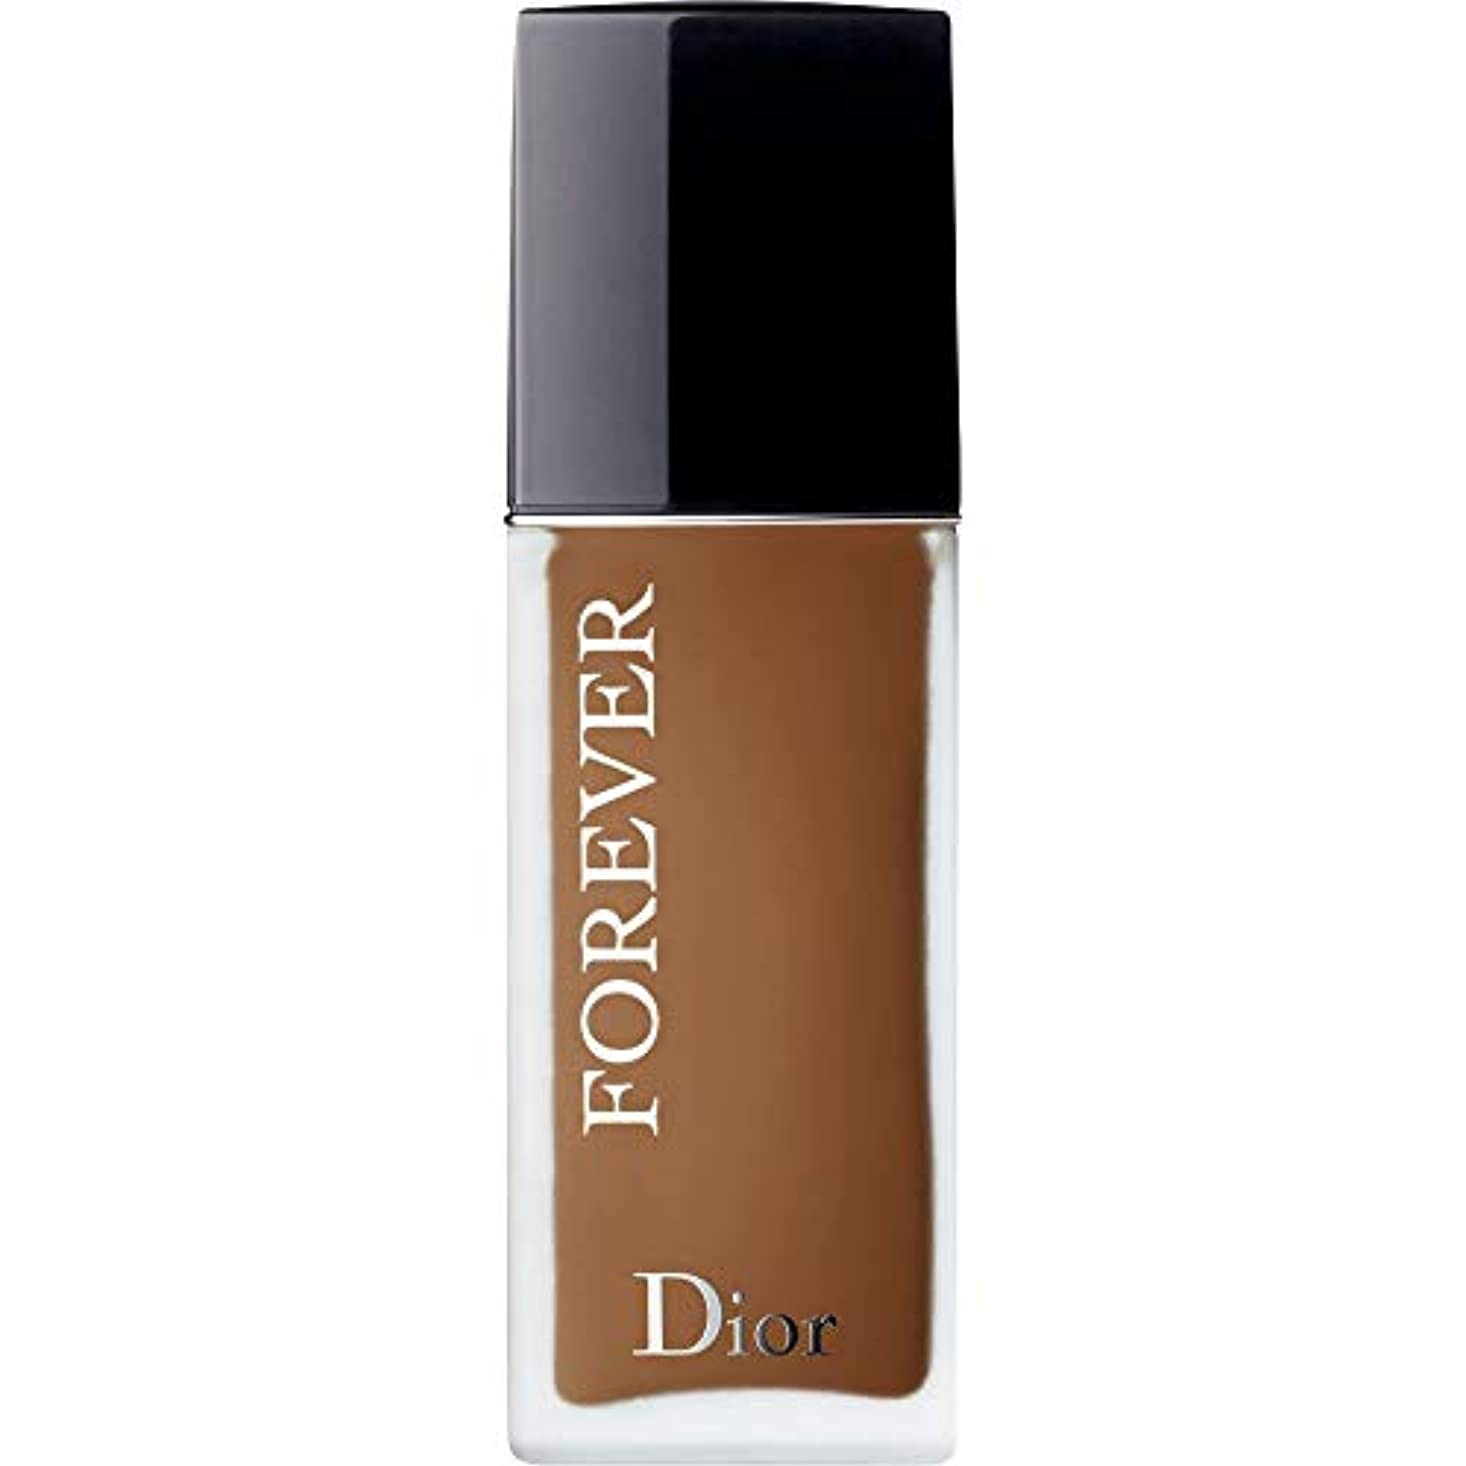 [Dior ] ディオール永遠皮膚思いやりの基盤Spf35 30ミリリットルの7N - ニュートラル(つや消し) - DIOR Forever Skin-Caring Foundation SPF35 30ml 7N -...